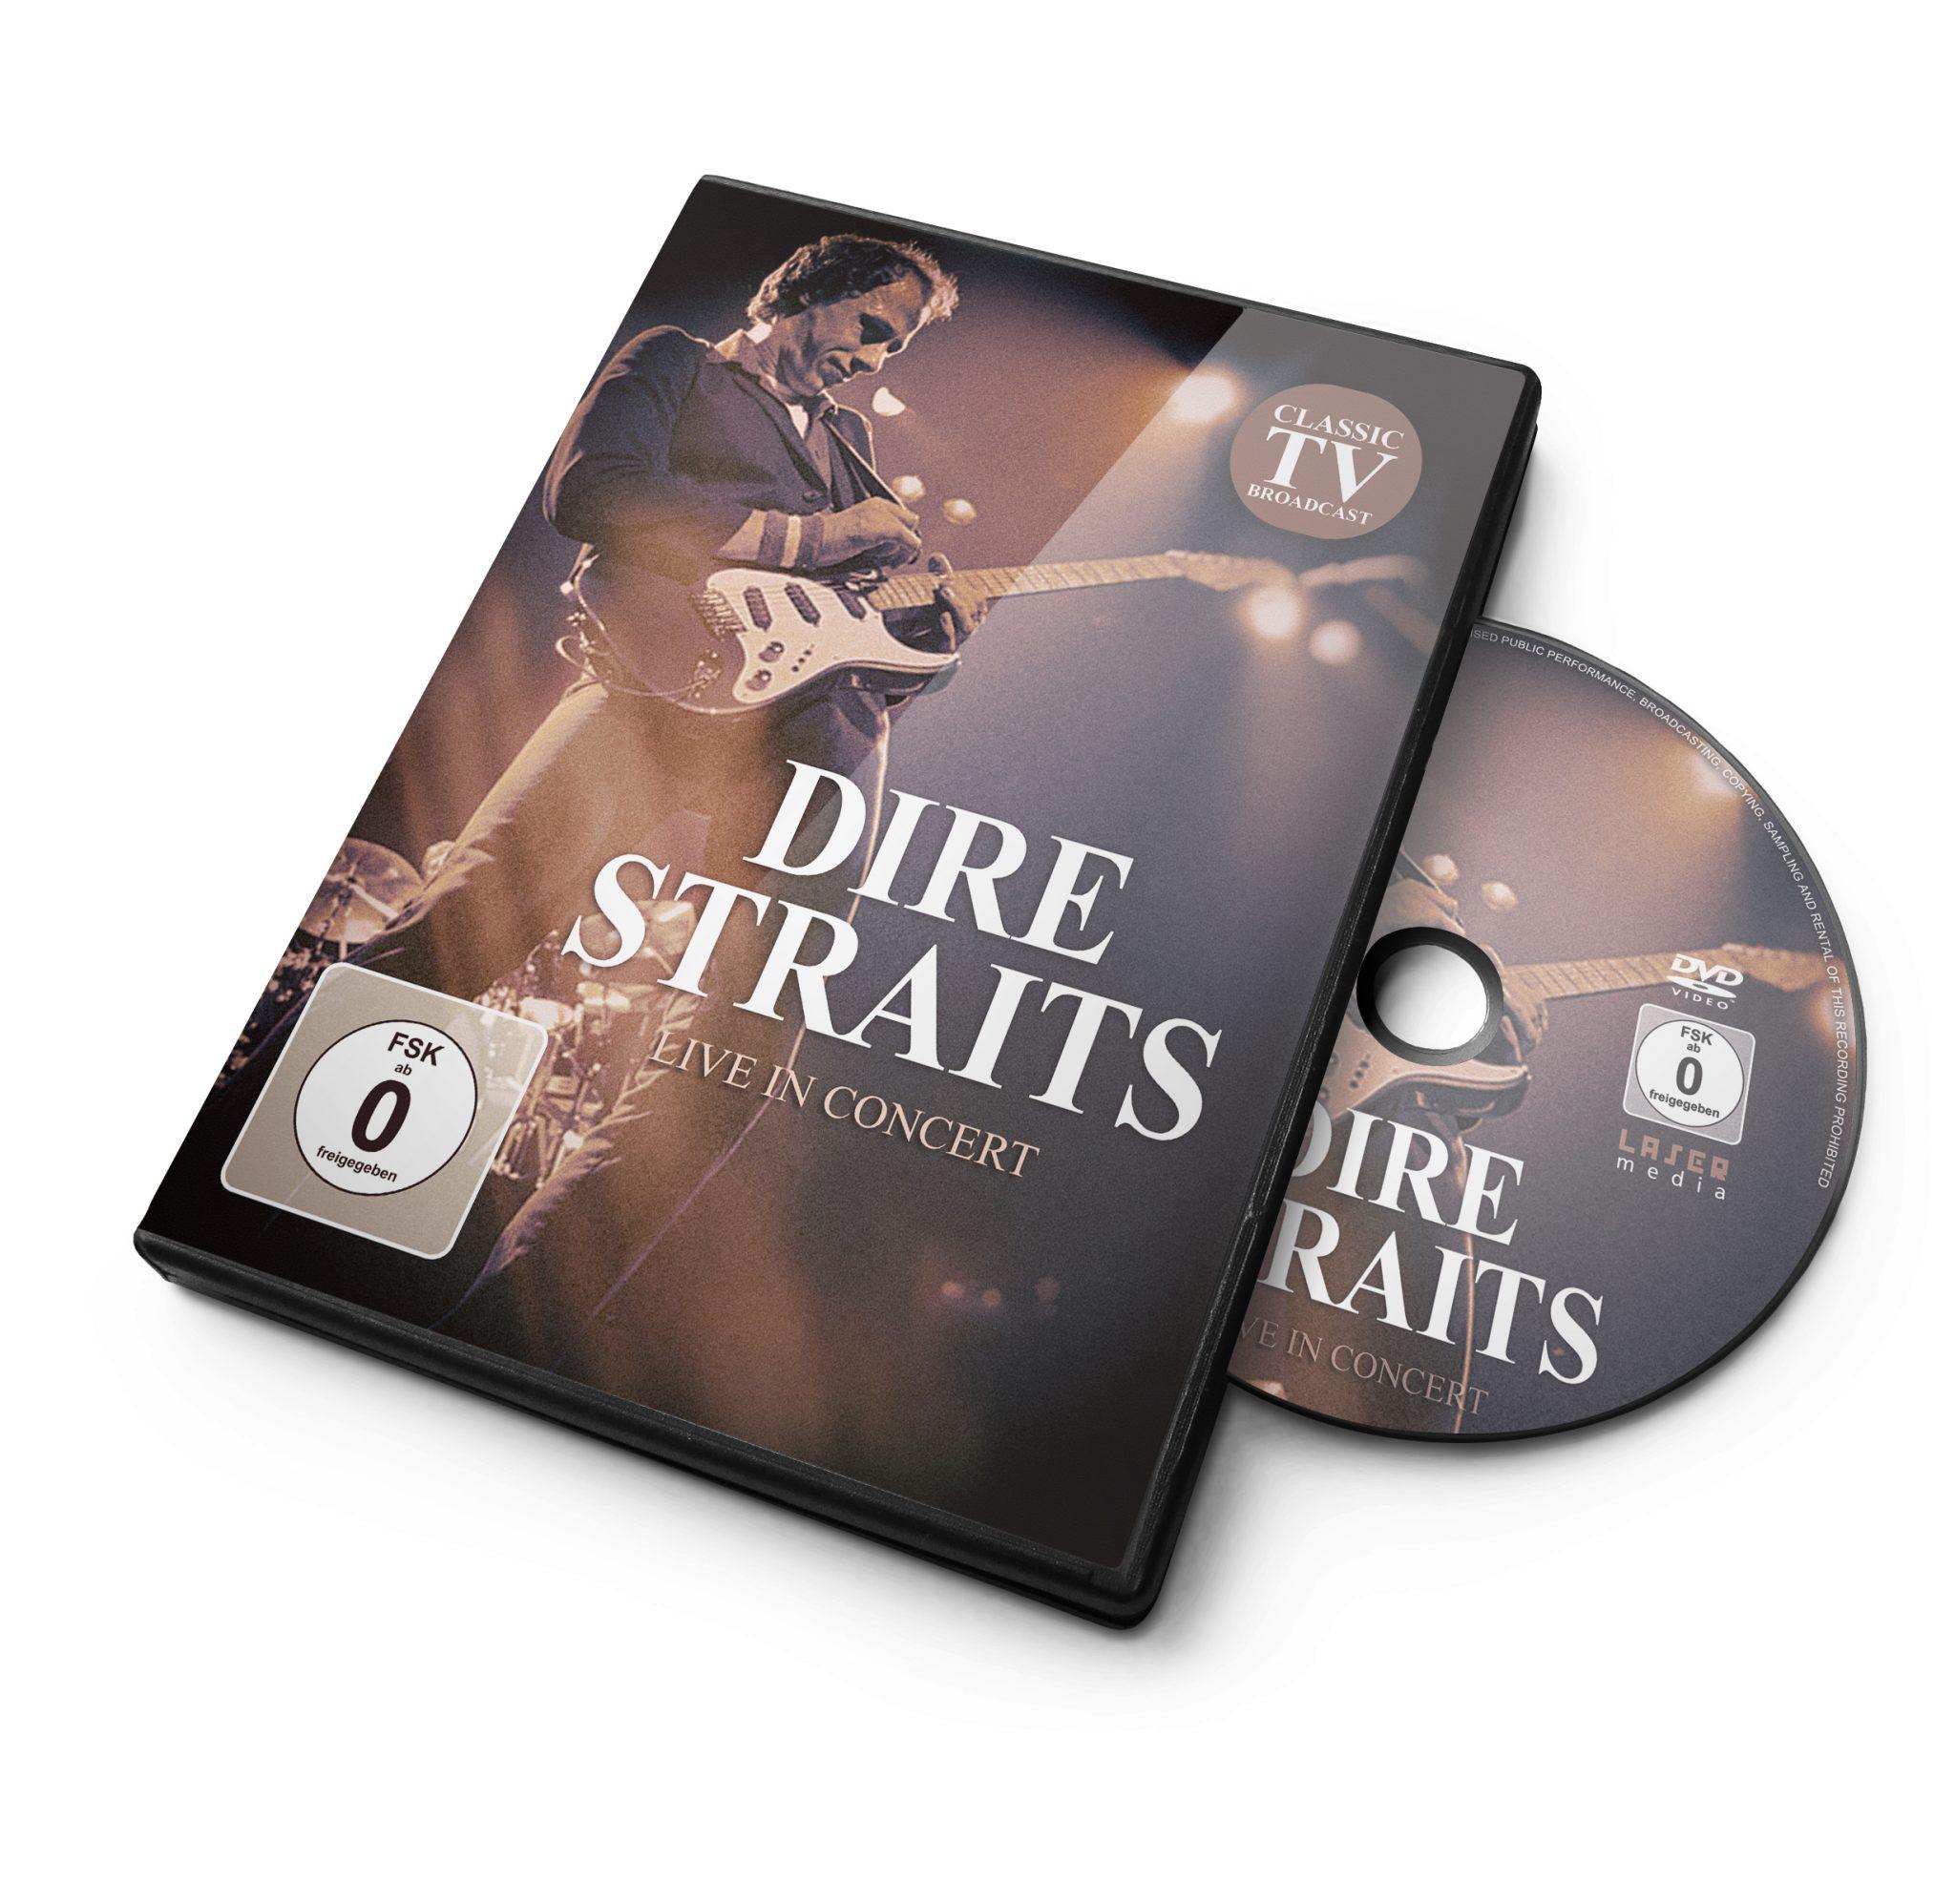 dire straits live_dvd